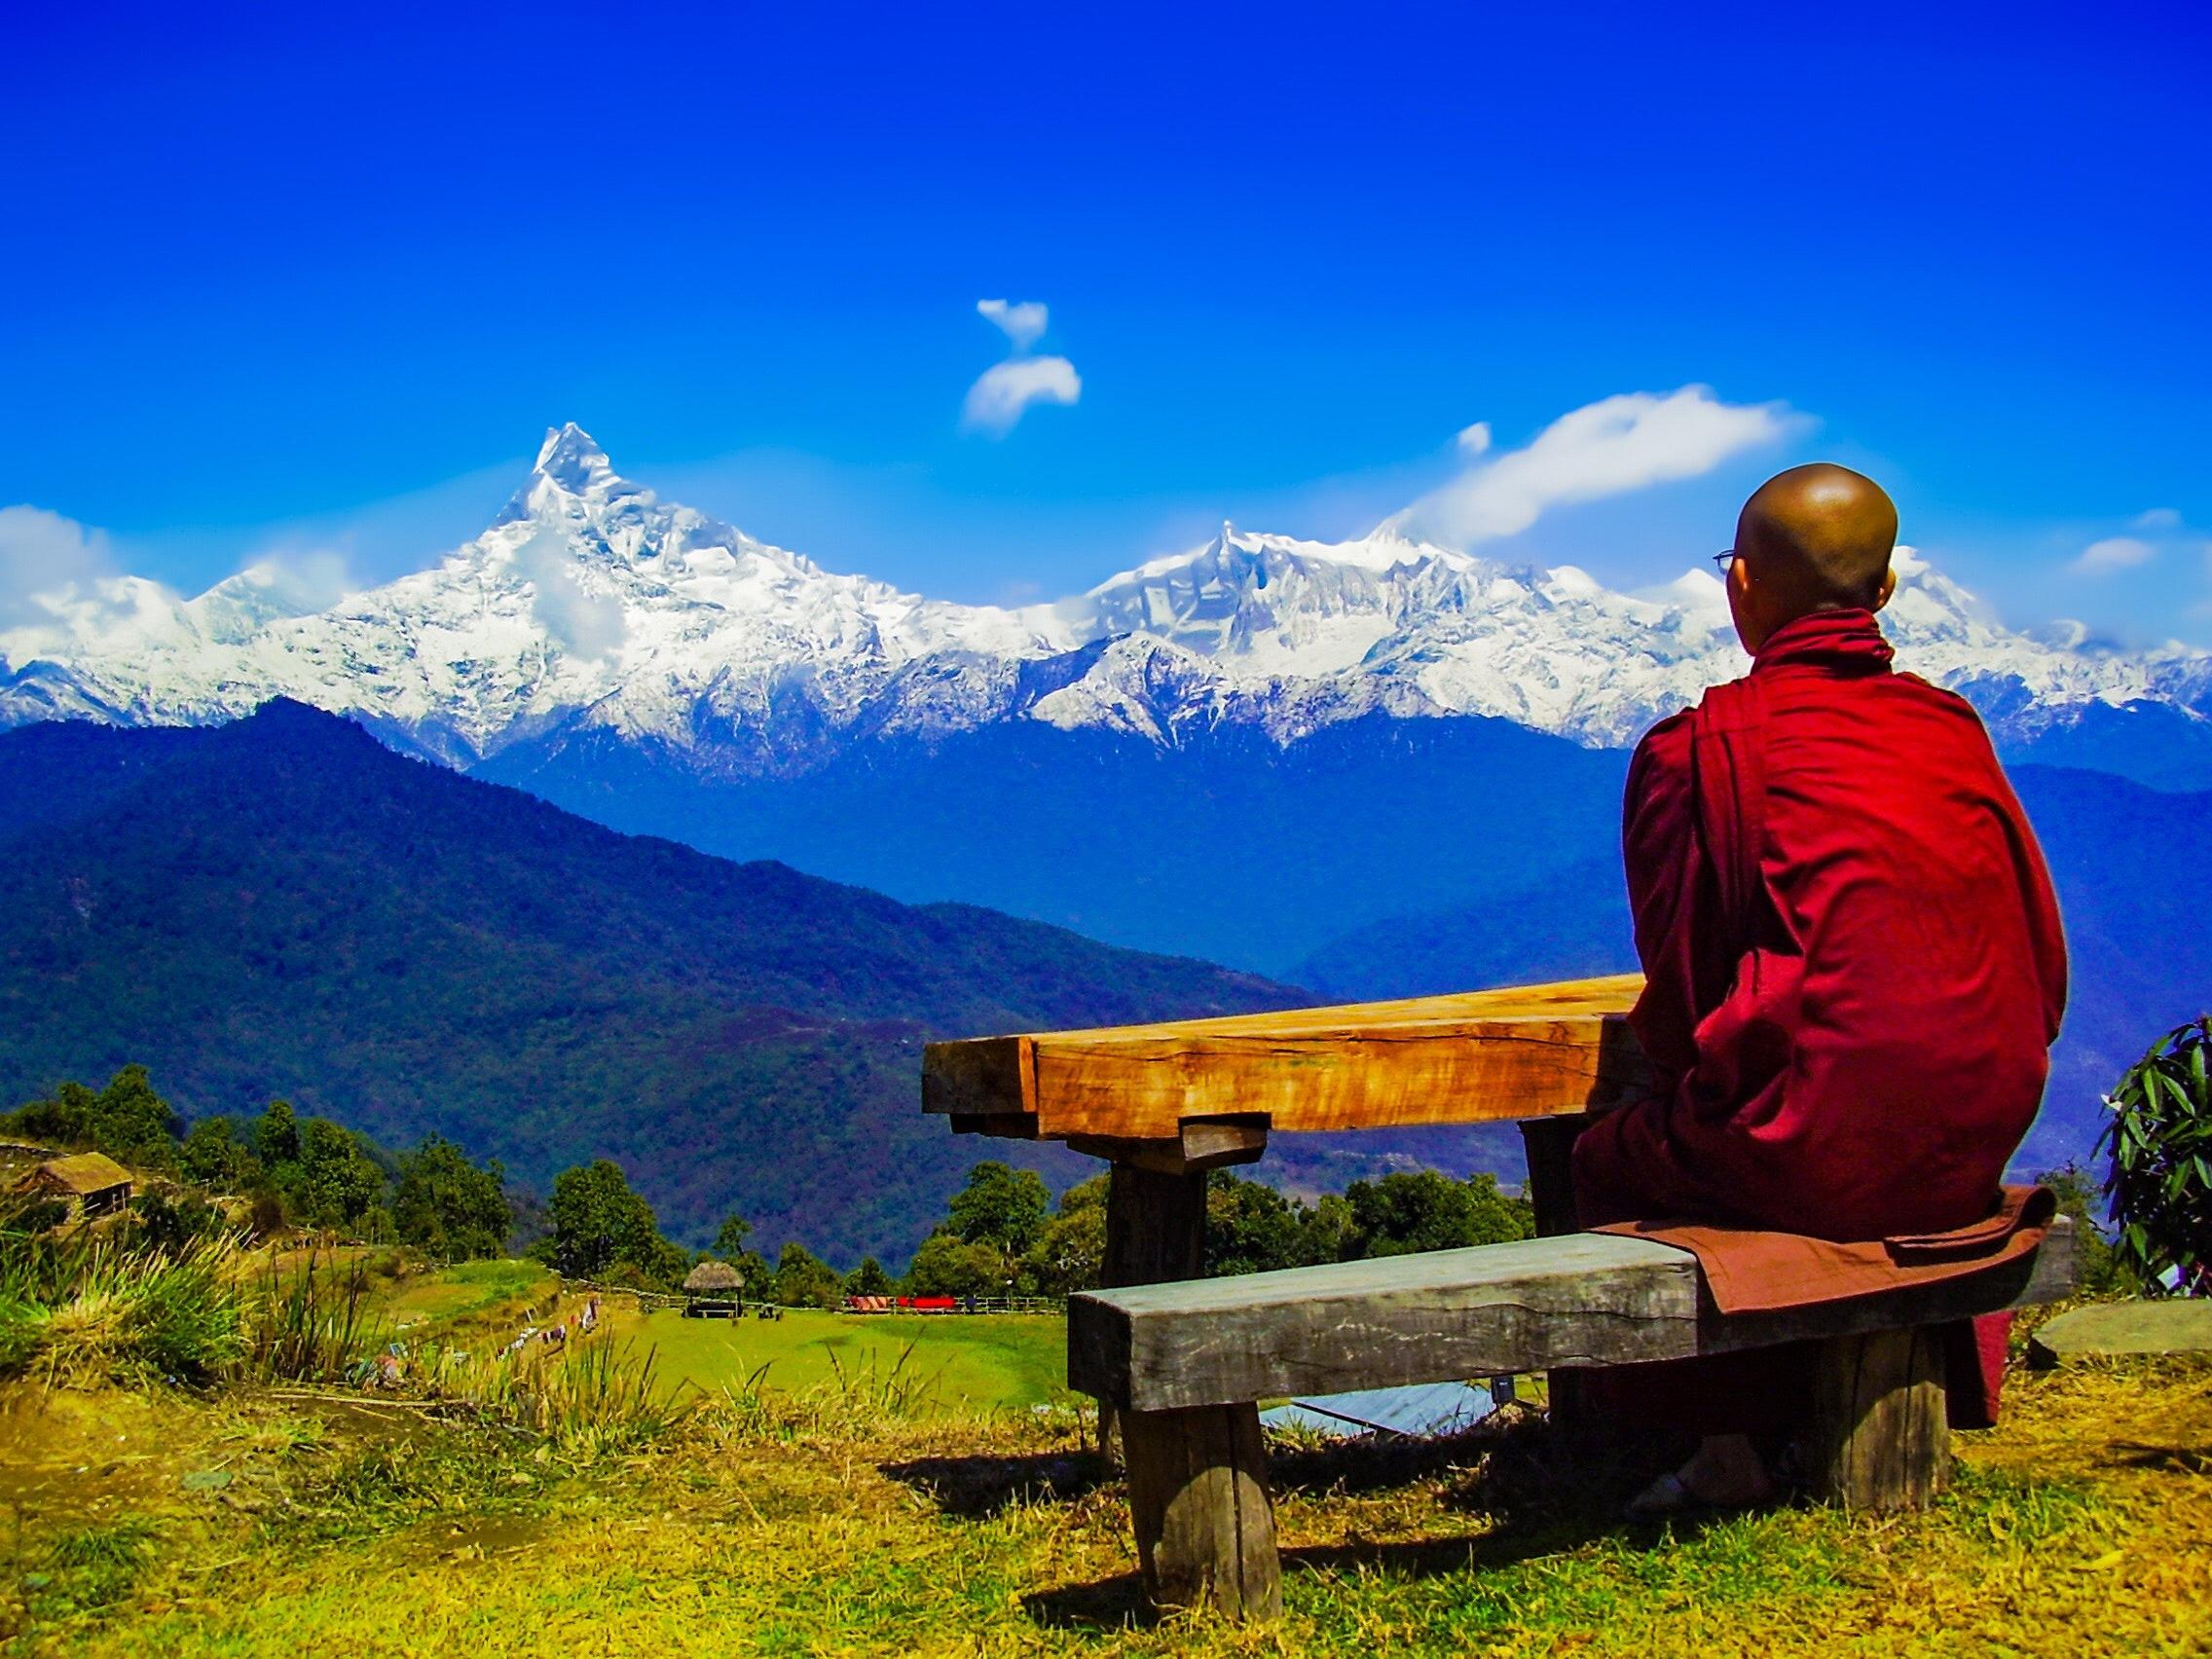 Mindfulness, meditation, mini meditations, self help techniques, self growth, wellbeing, body scan, vipassana, samadhi, compassion